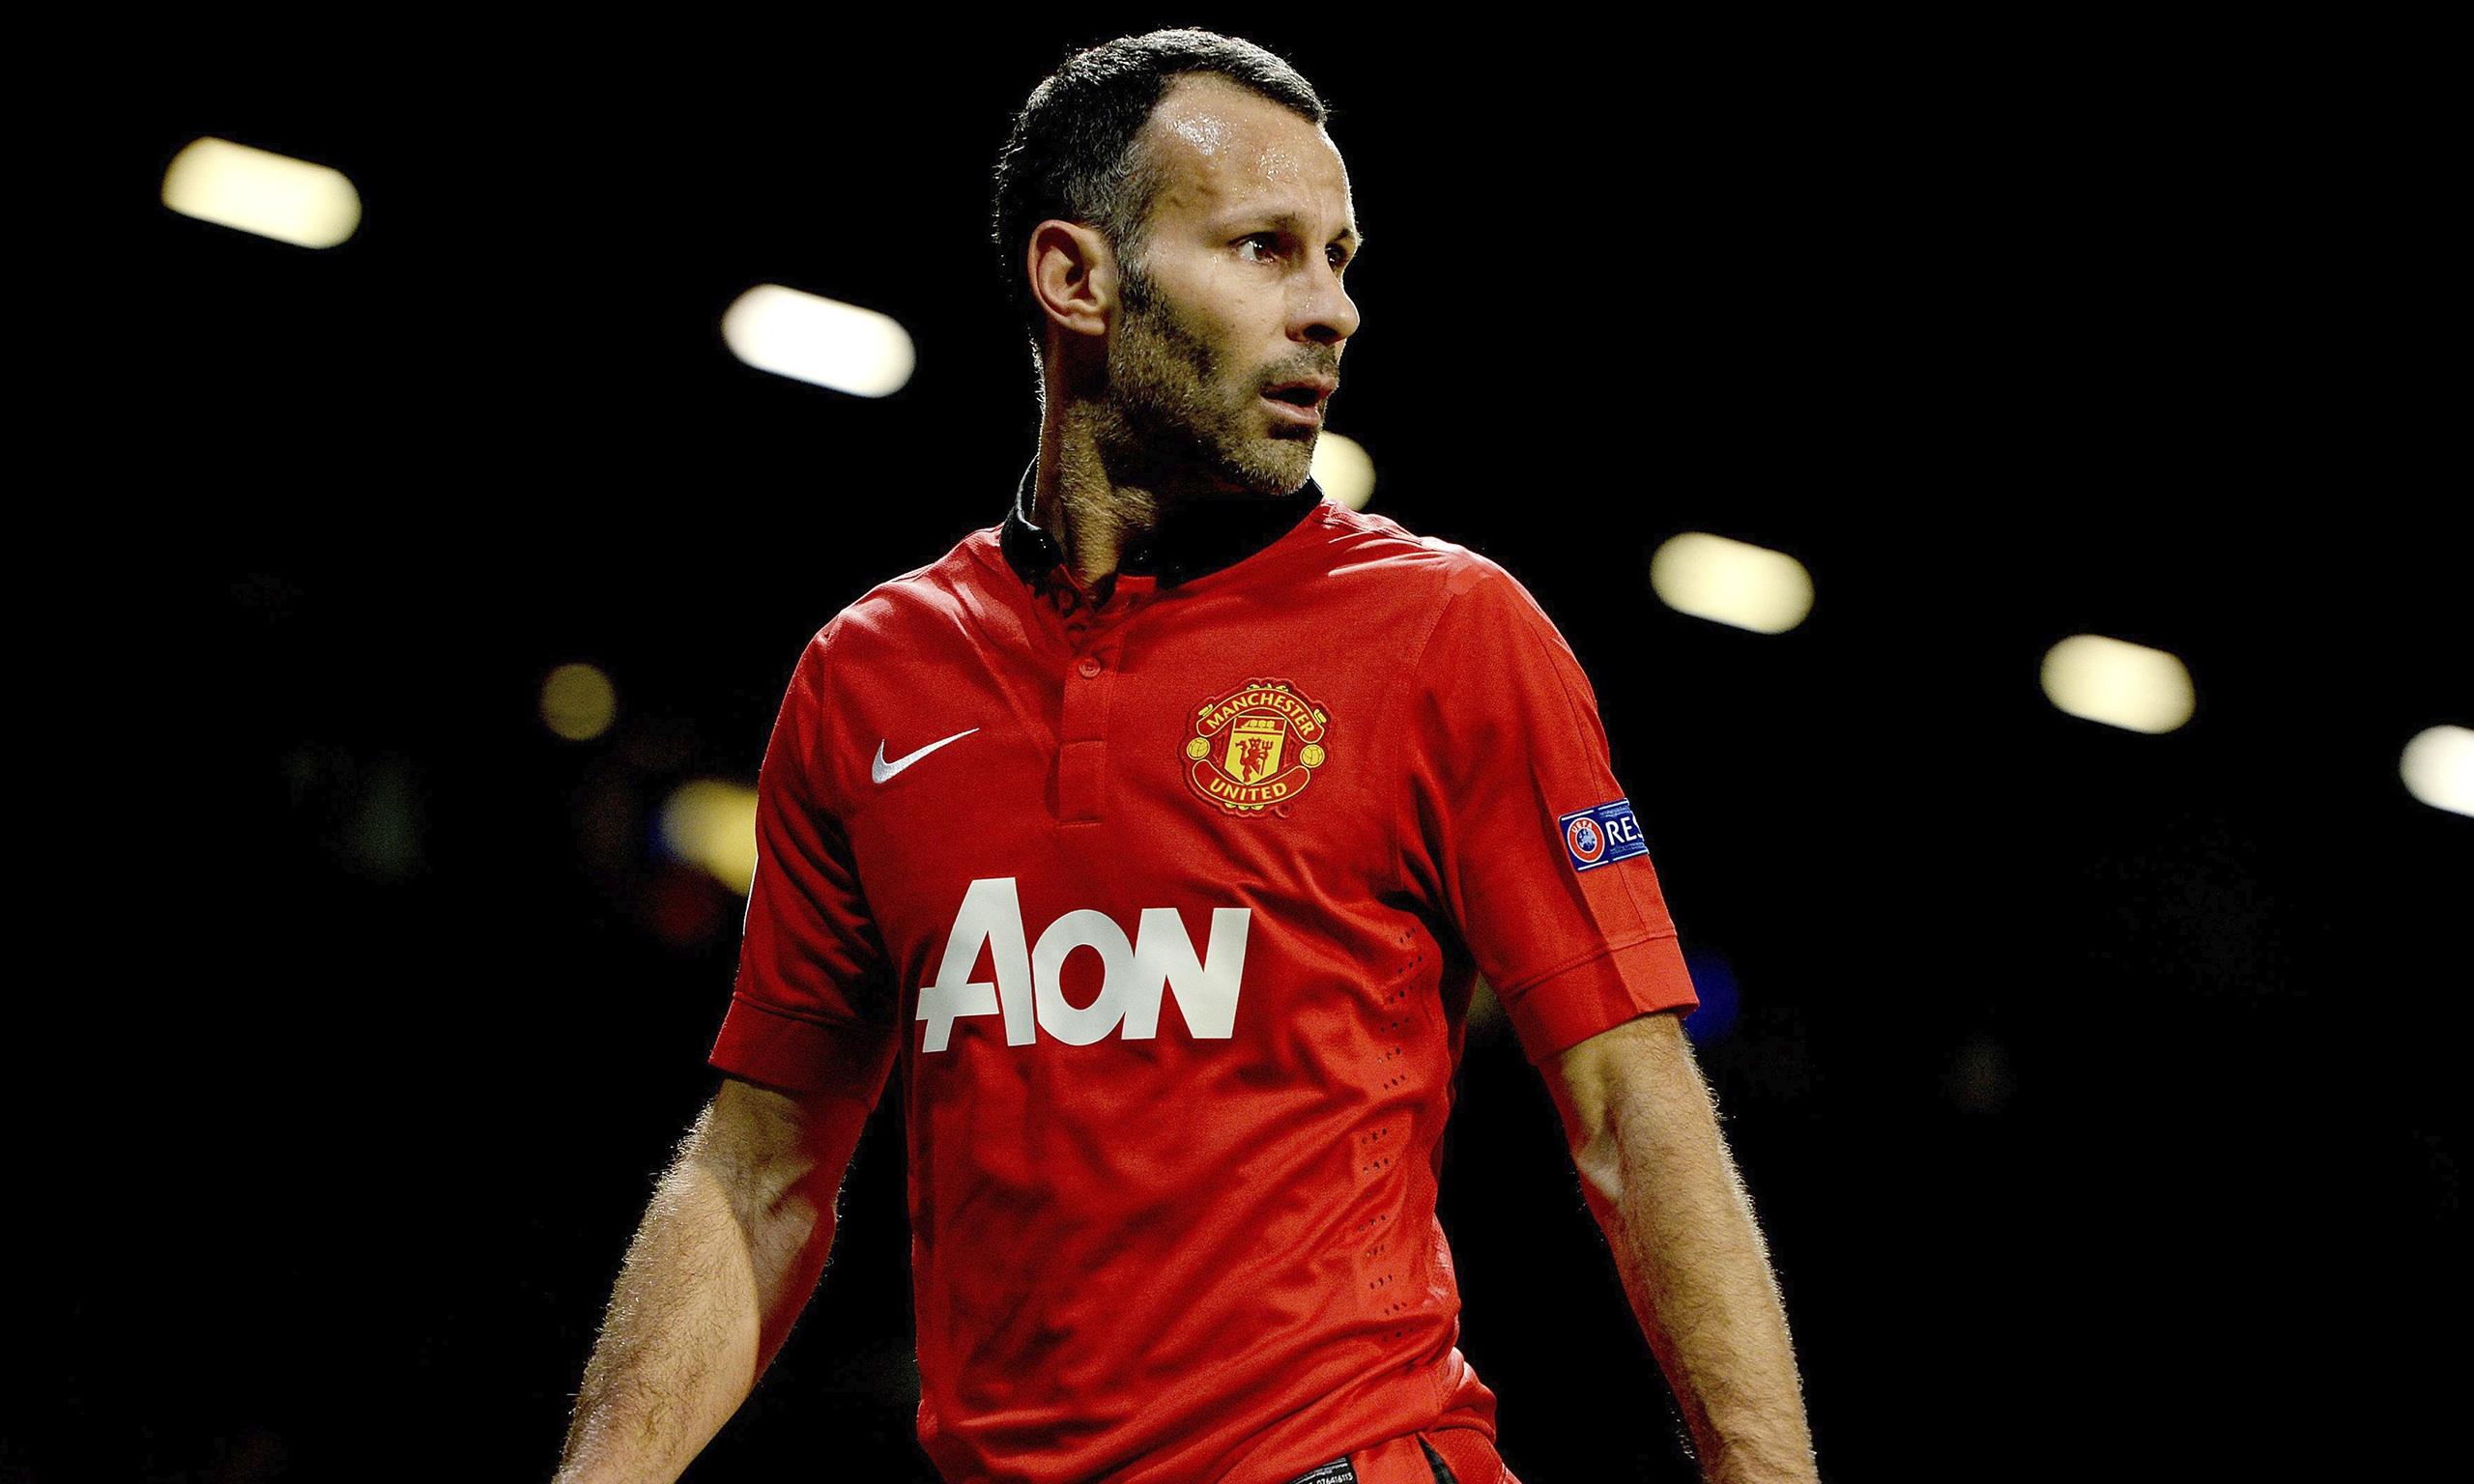 Manchester-United-Ryan-Gi-014.jpgRyan Giggs 2013 2014